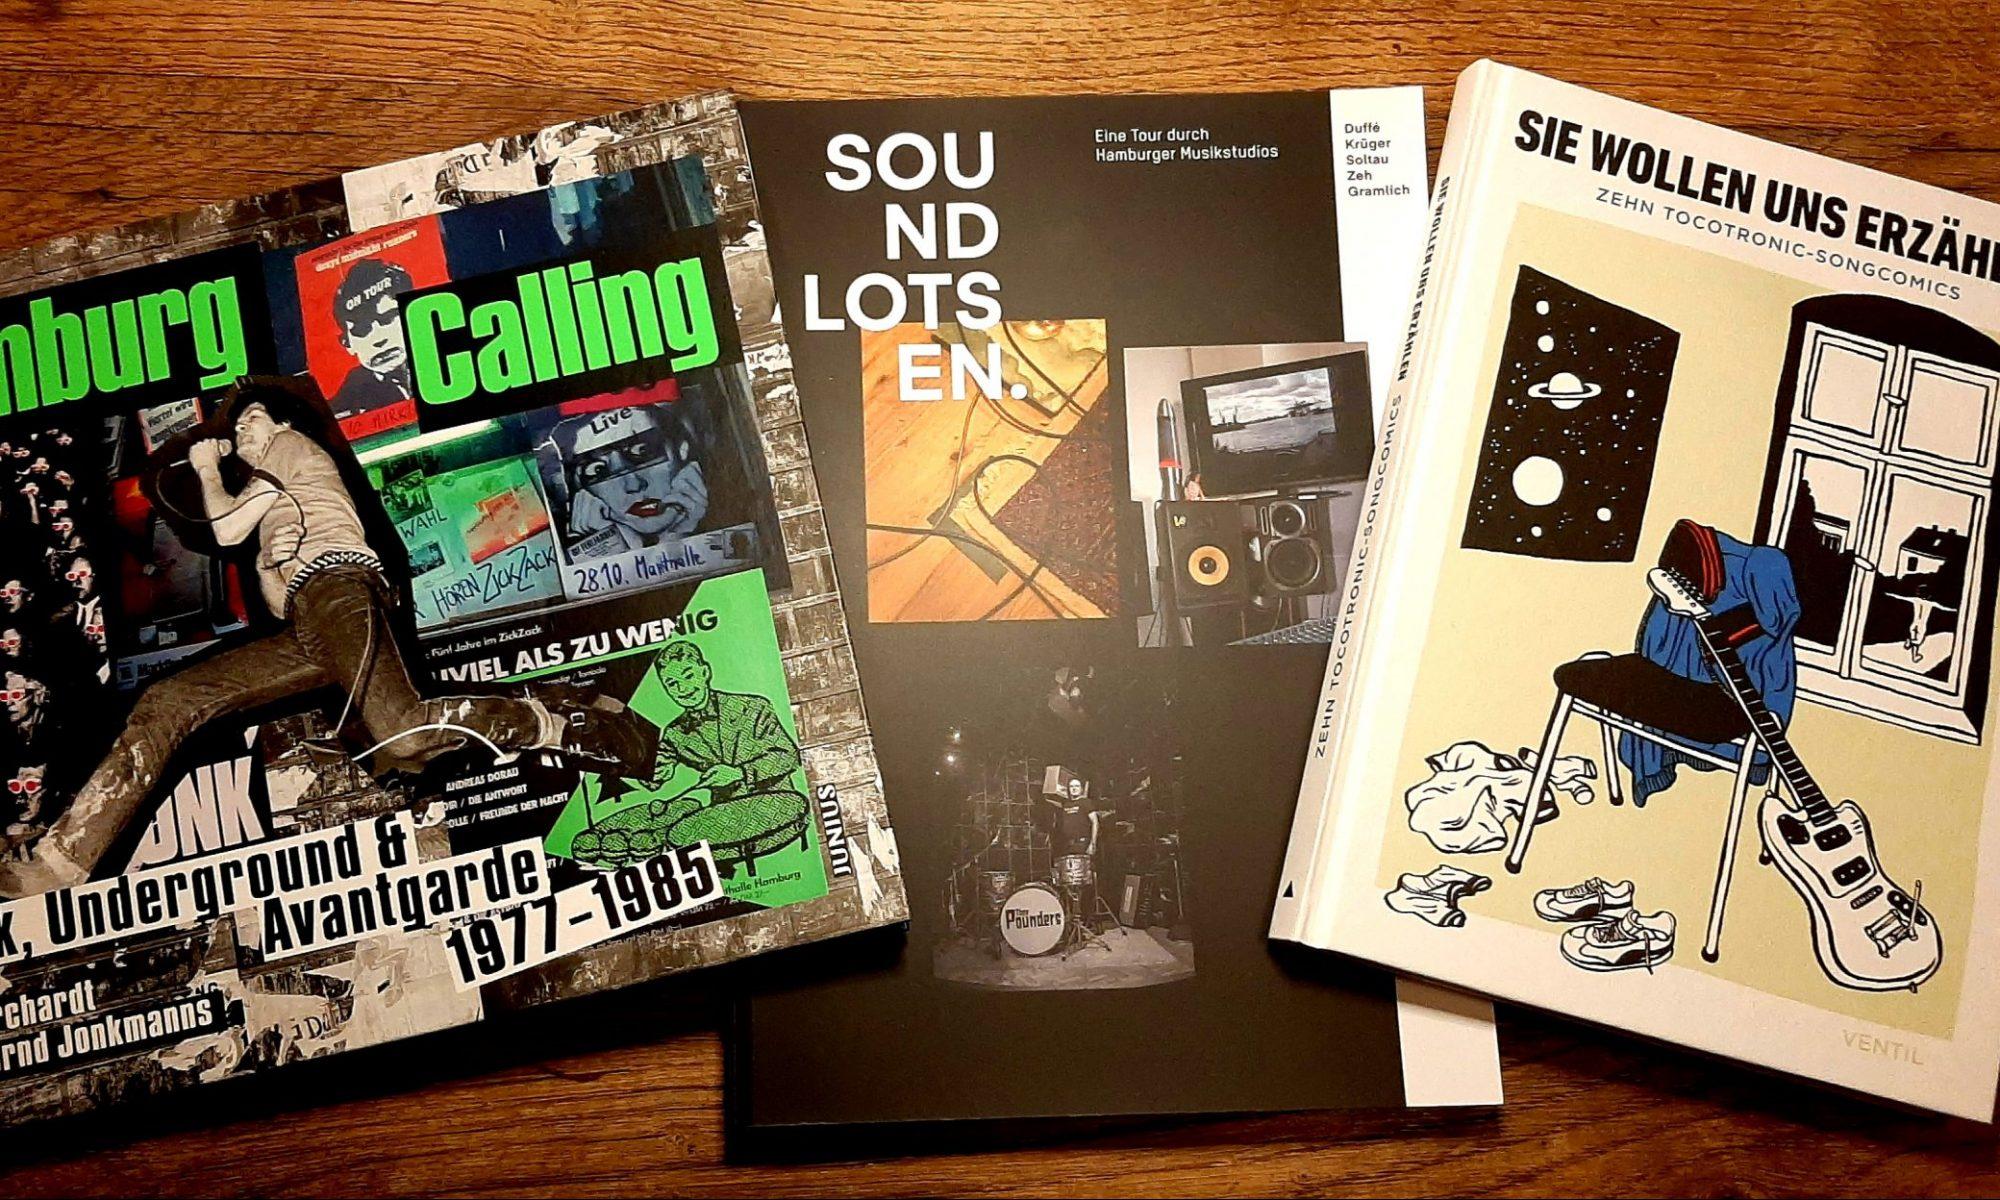 Buchcover, Musikbücher, Hamburg Calling, Soundlotsen, Tocotronic, Sie wollen uns erzählen, Songcomics, Junius Verlag, Ventil Verlag, Copasetic